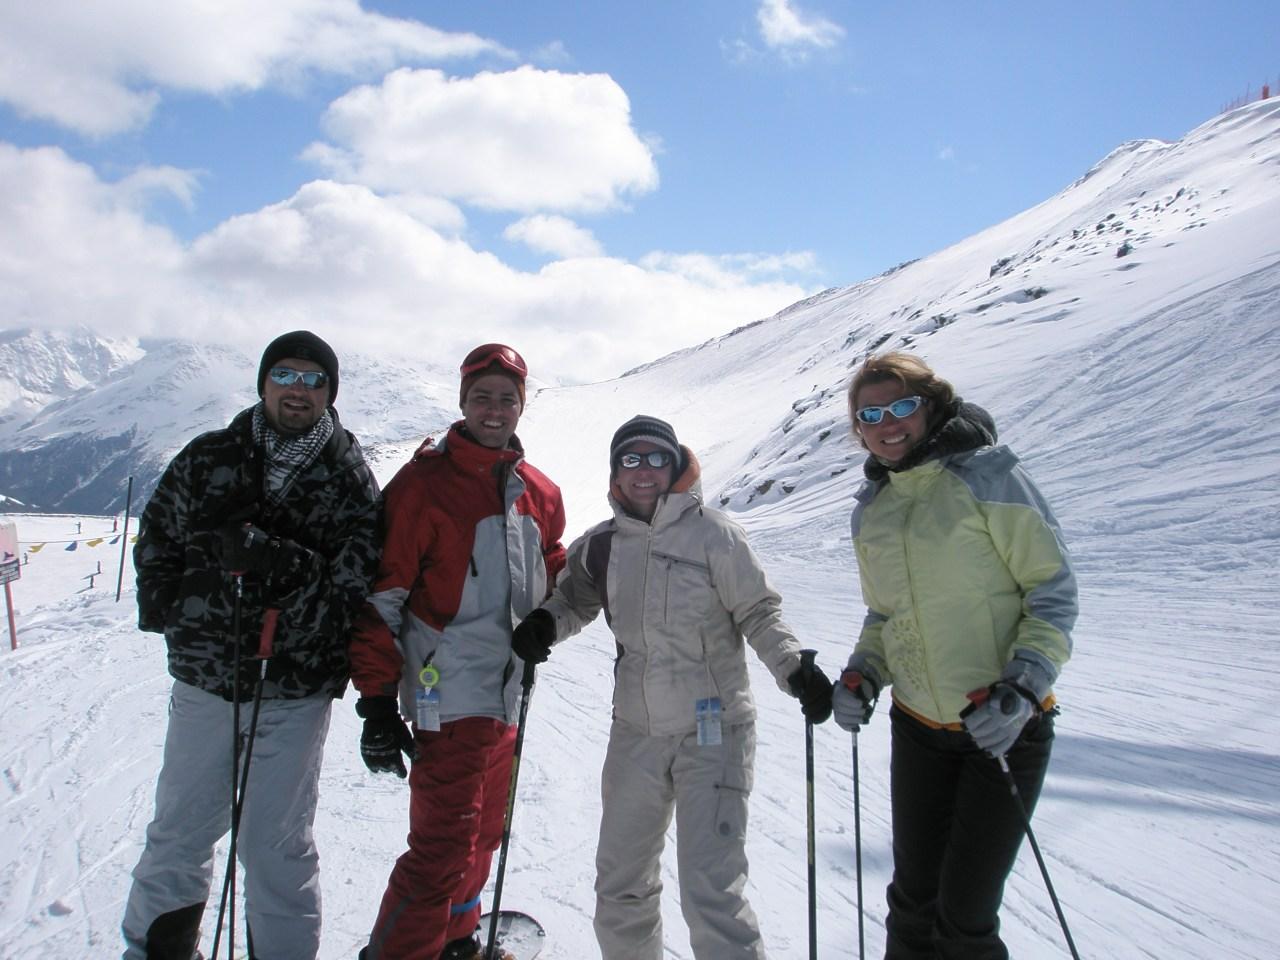 Best ski resorts in Europe: Bormio